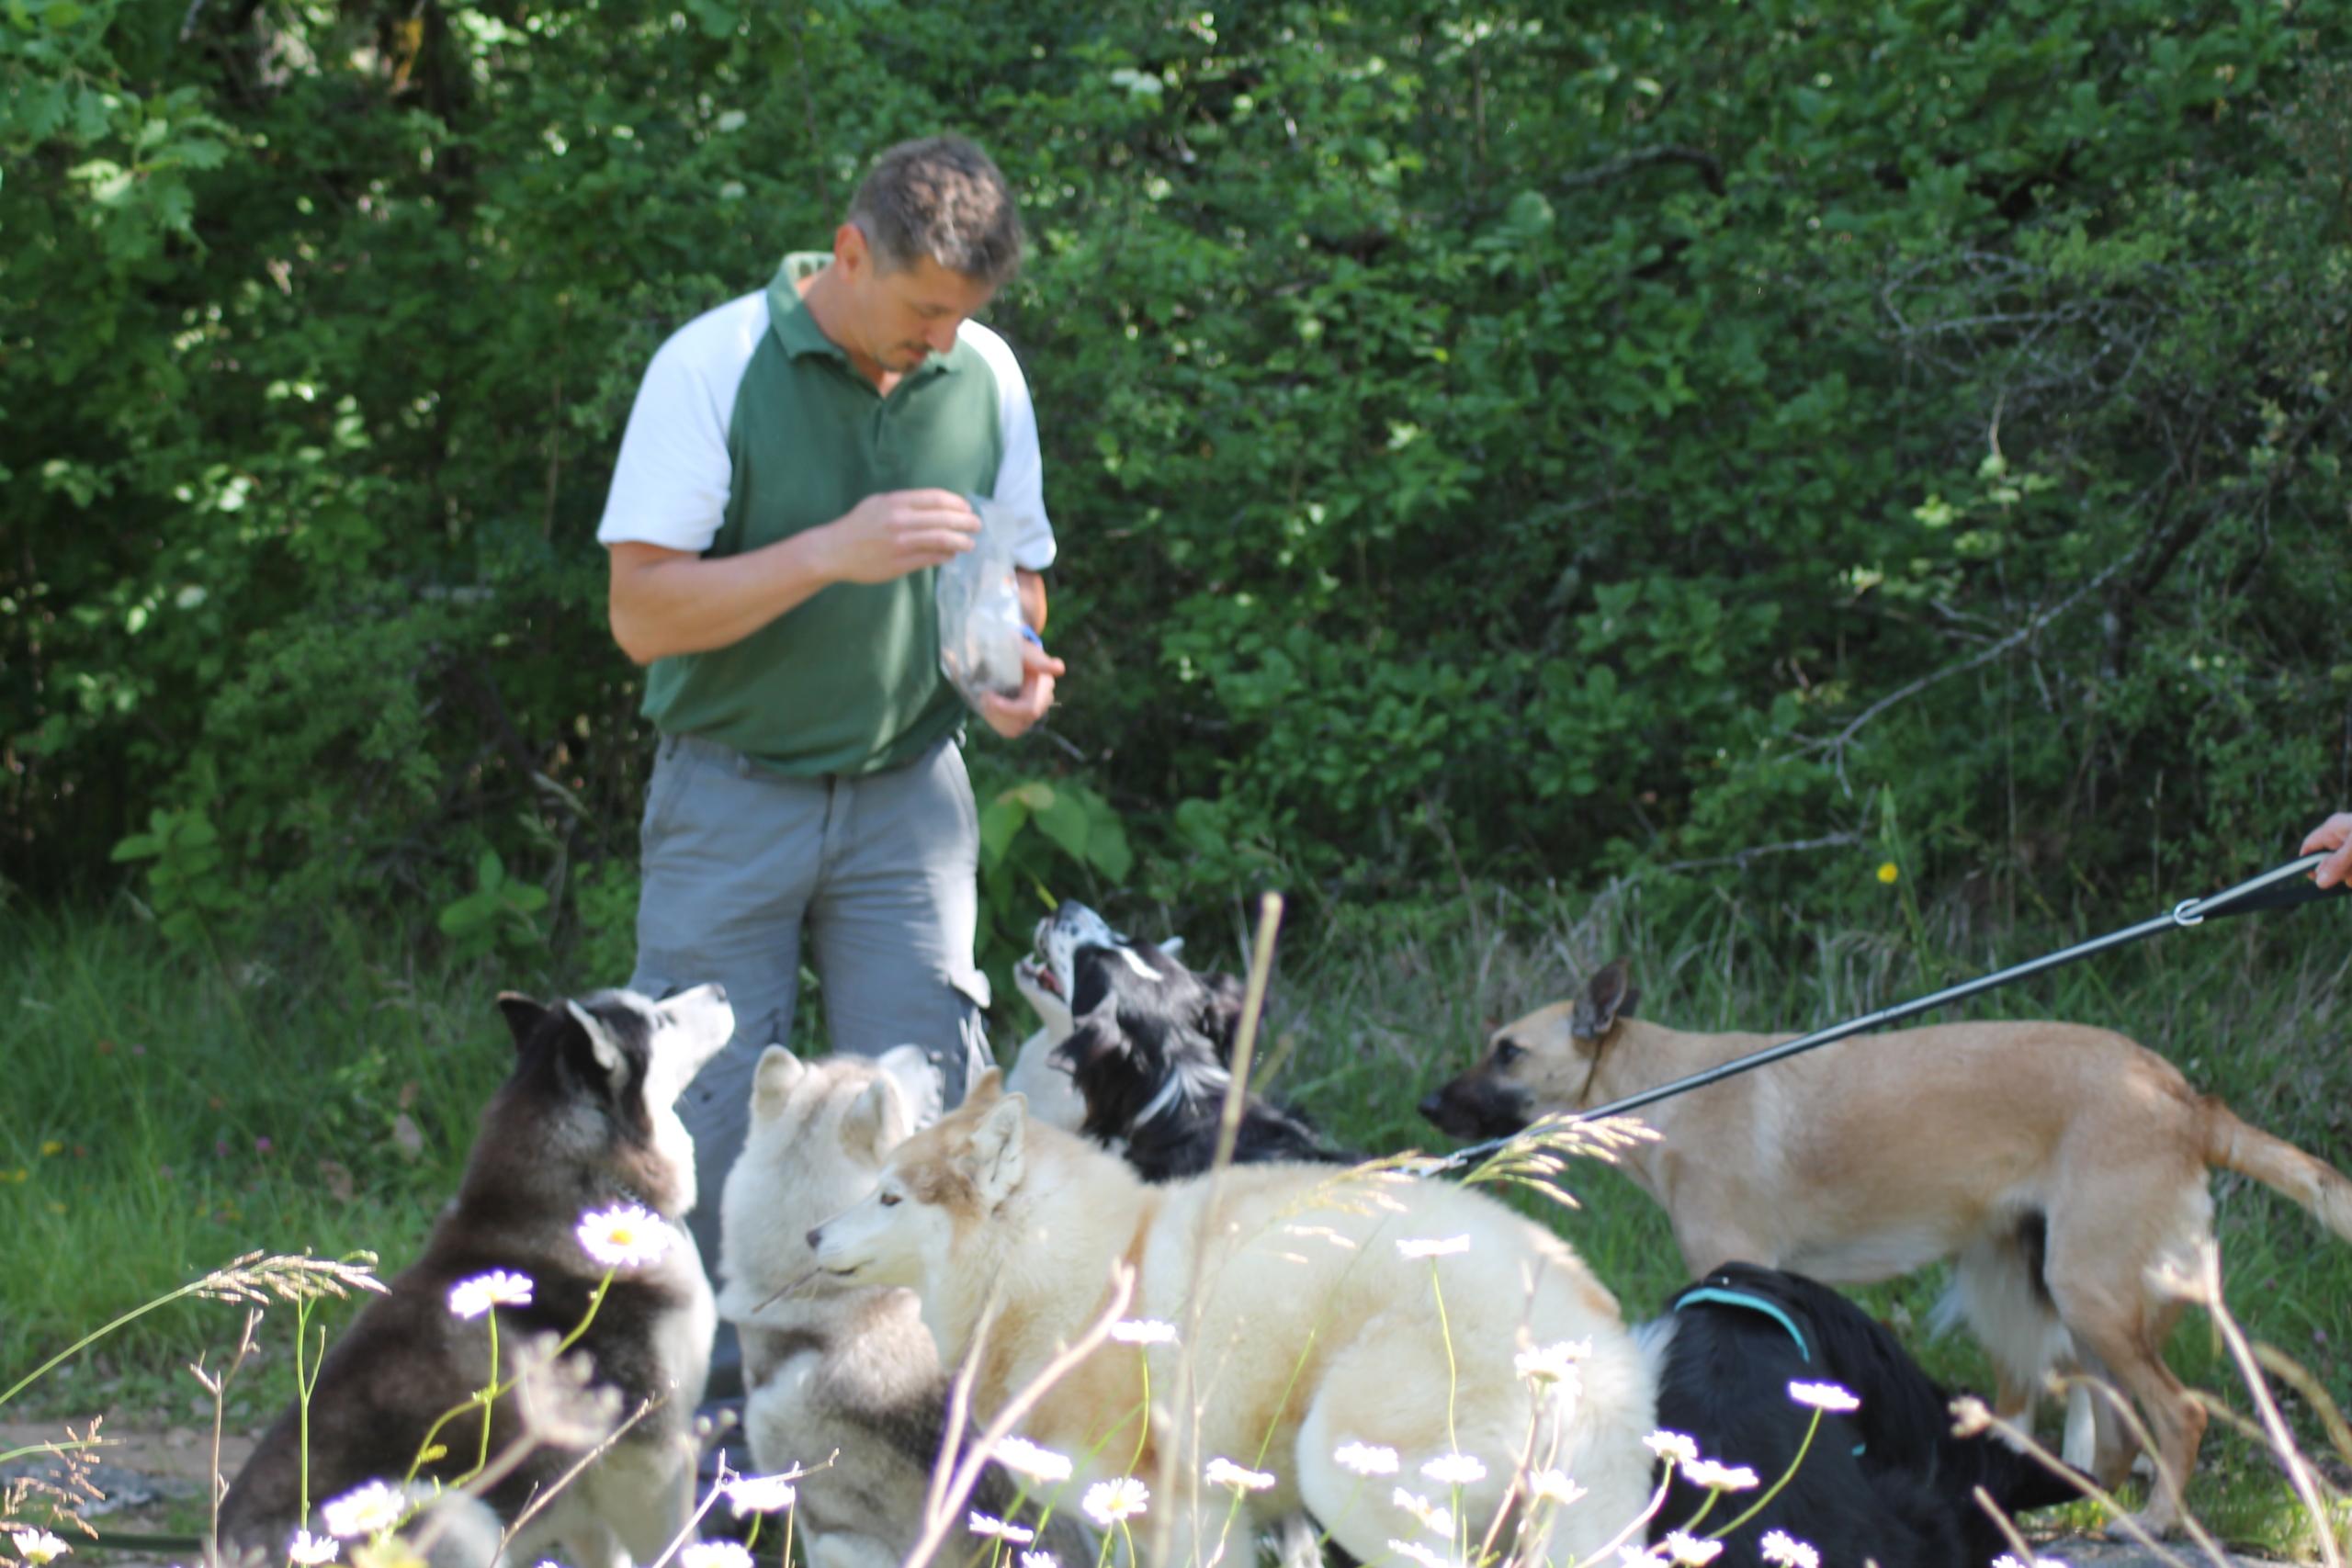 Balades canines Au Coeur des Chiens Angoulême